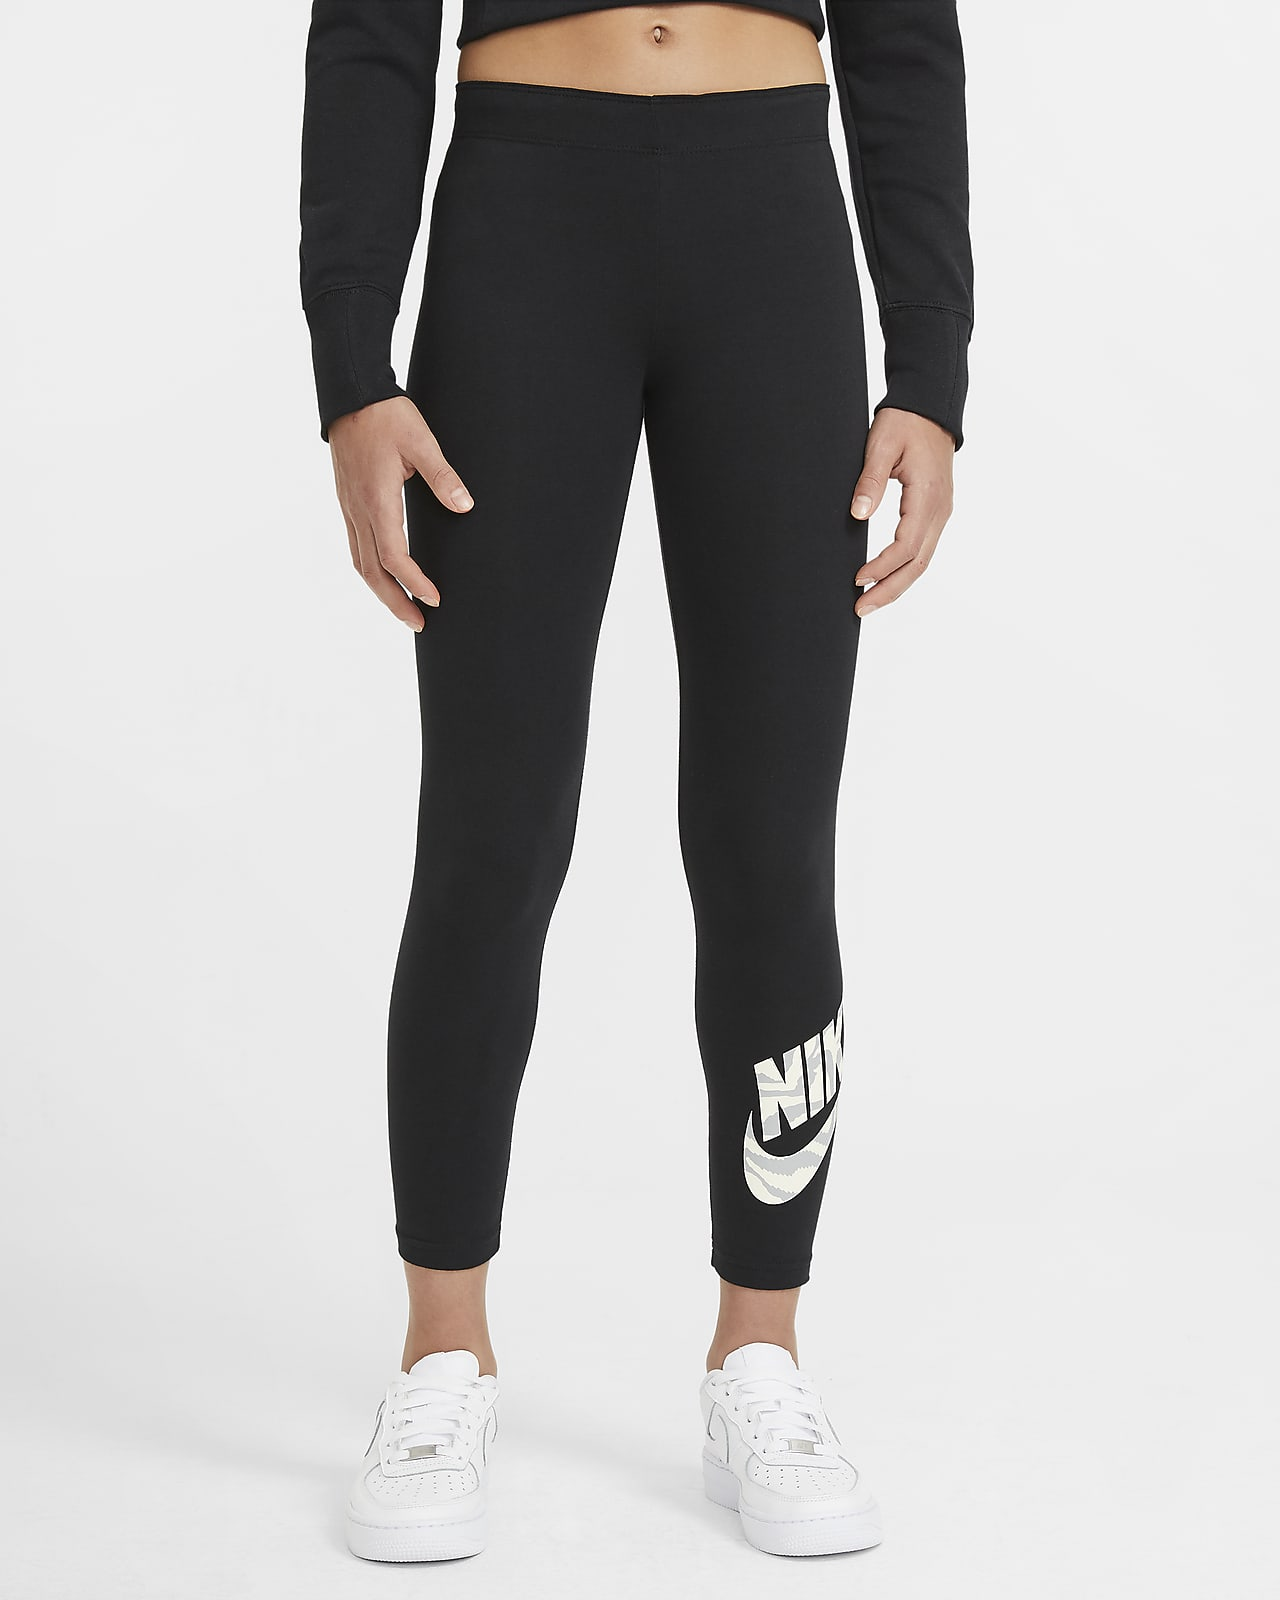 Leggings com grafismo Nike Sportswear Favorites Júnior (Rapariga)